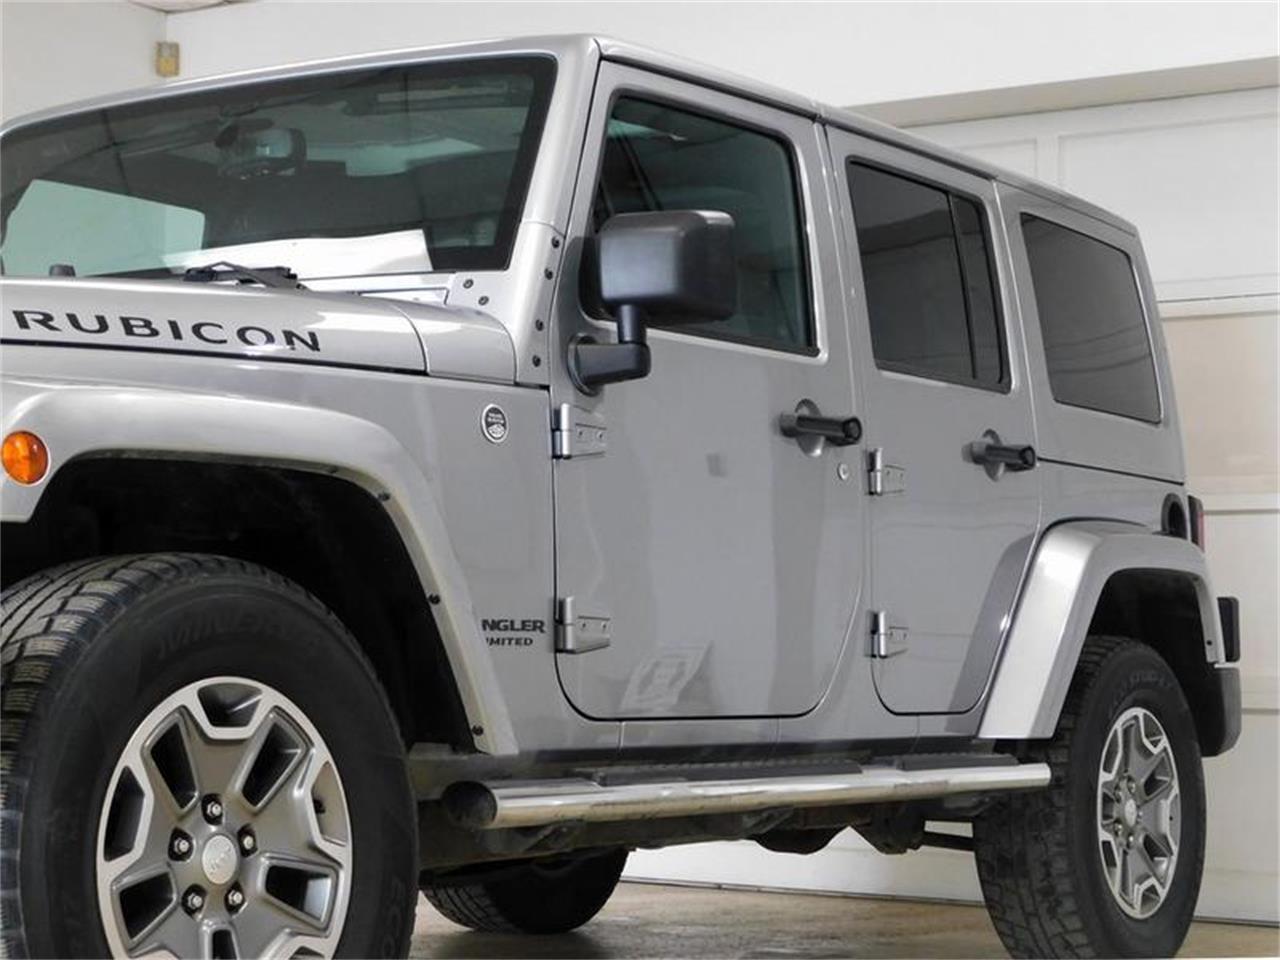 2014 Jeep Wrangler Rubicon (CC-1200765) for sale in Hamburg, New York